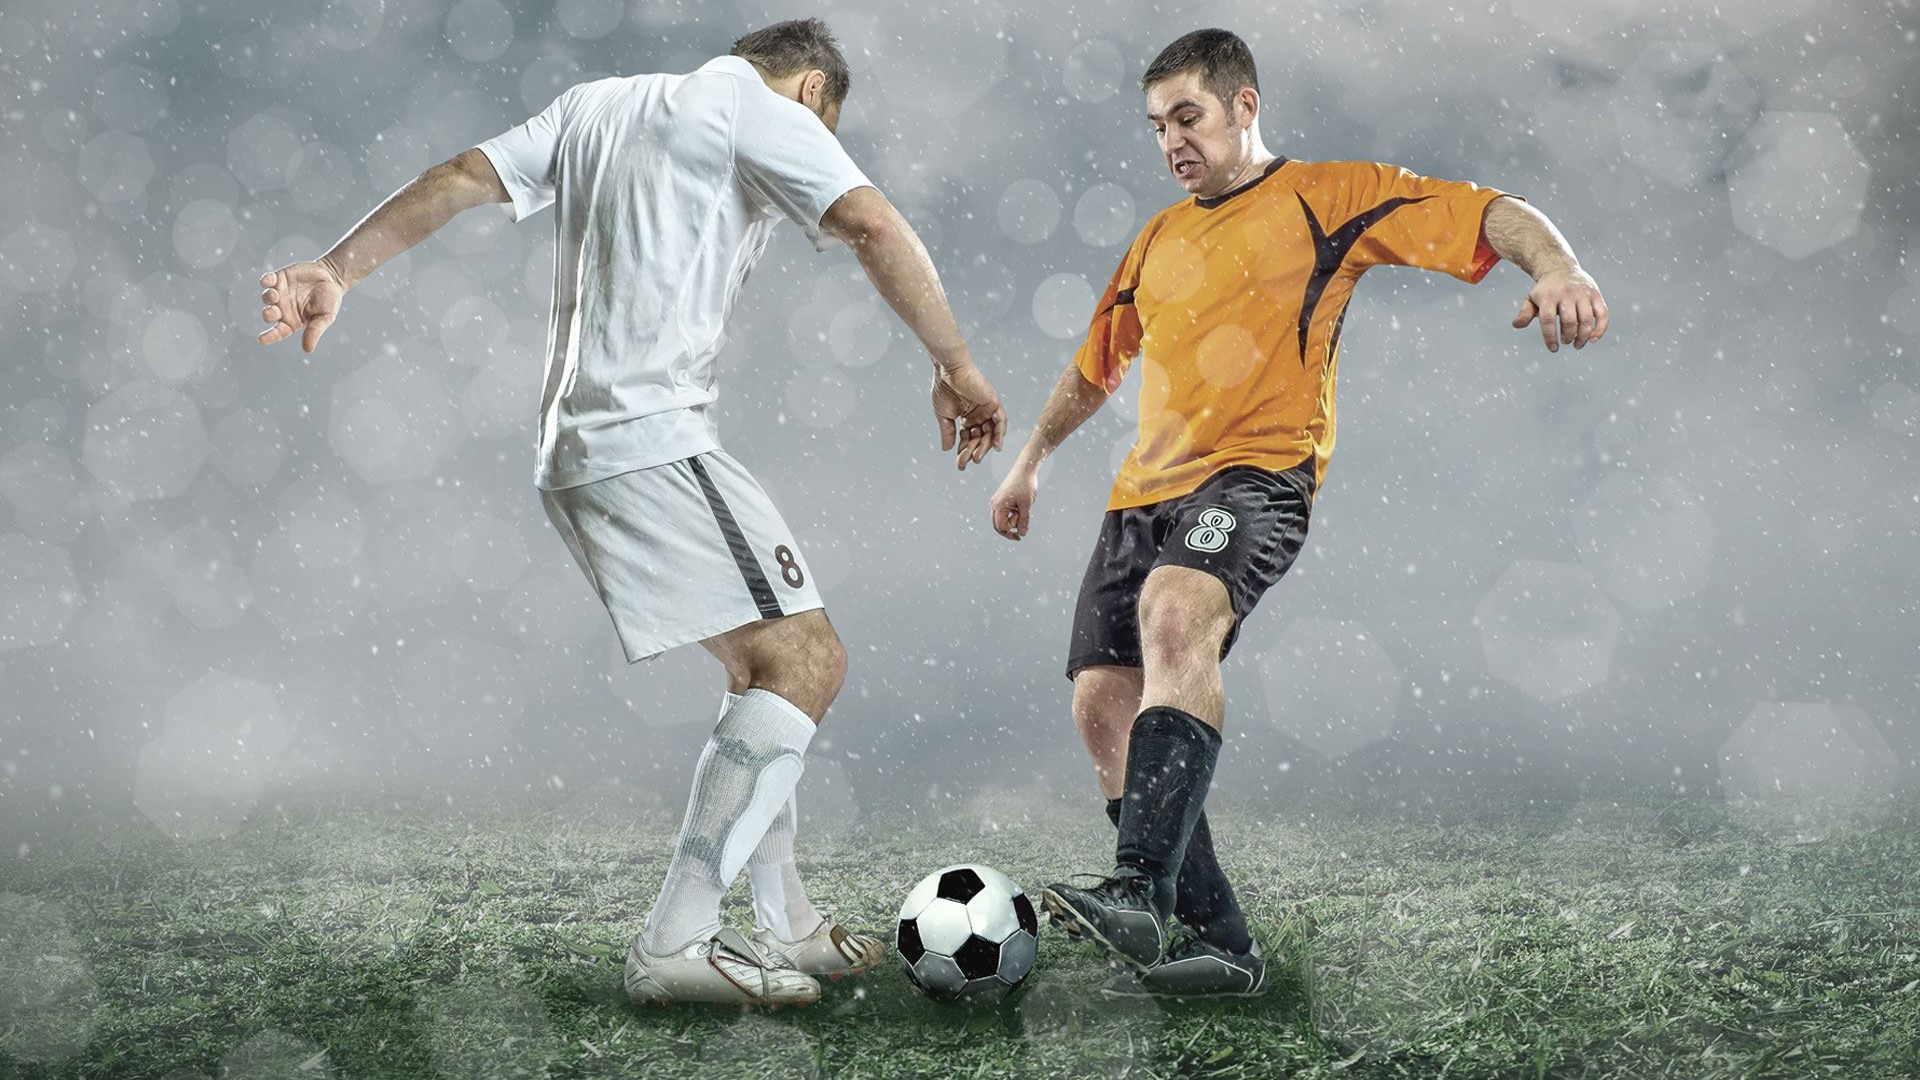 live-gloucester-rugby-vs-worcester-warriors-online